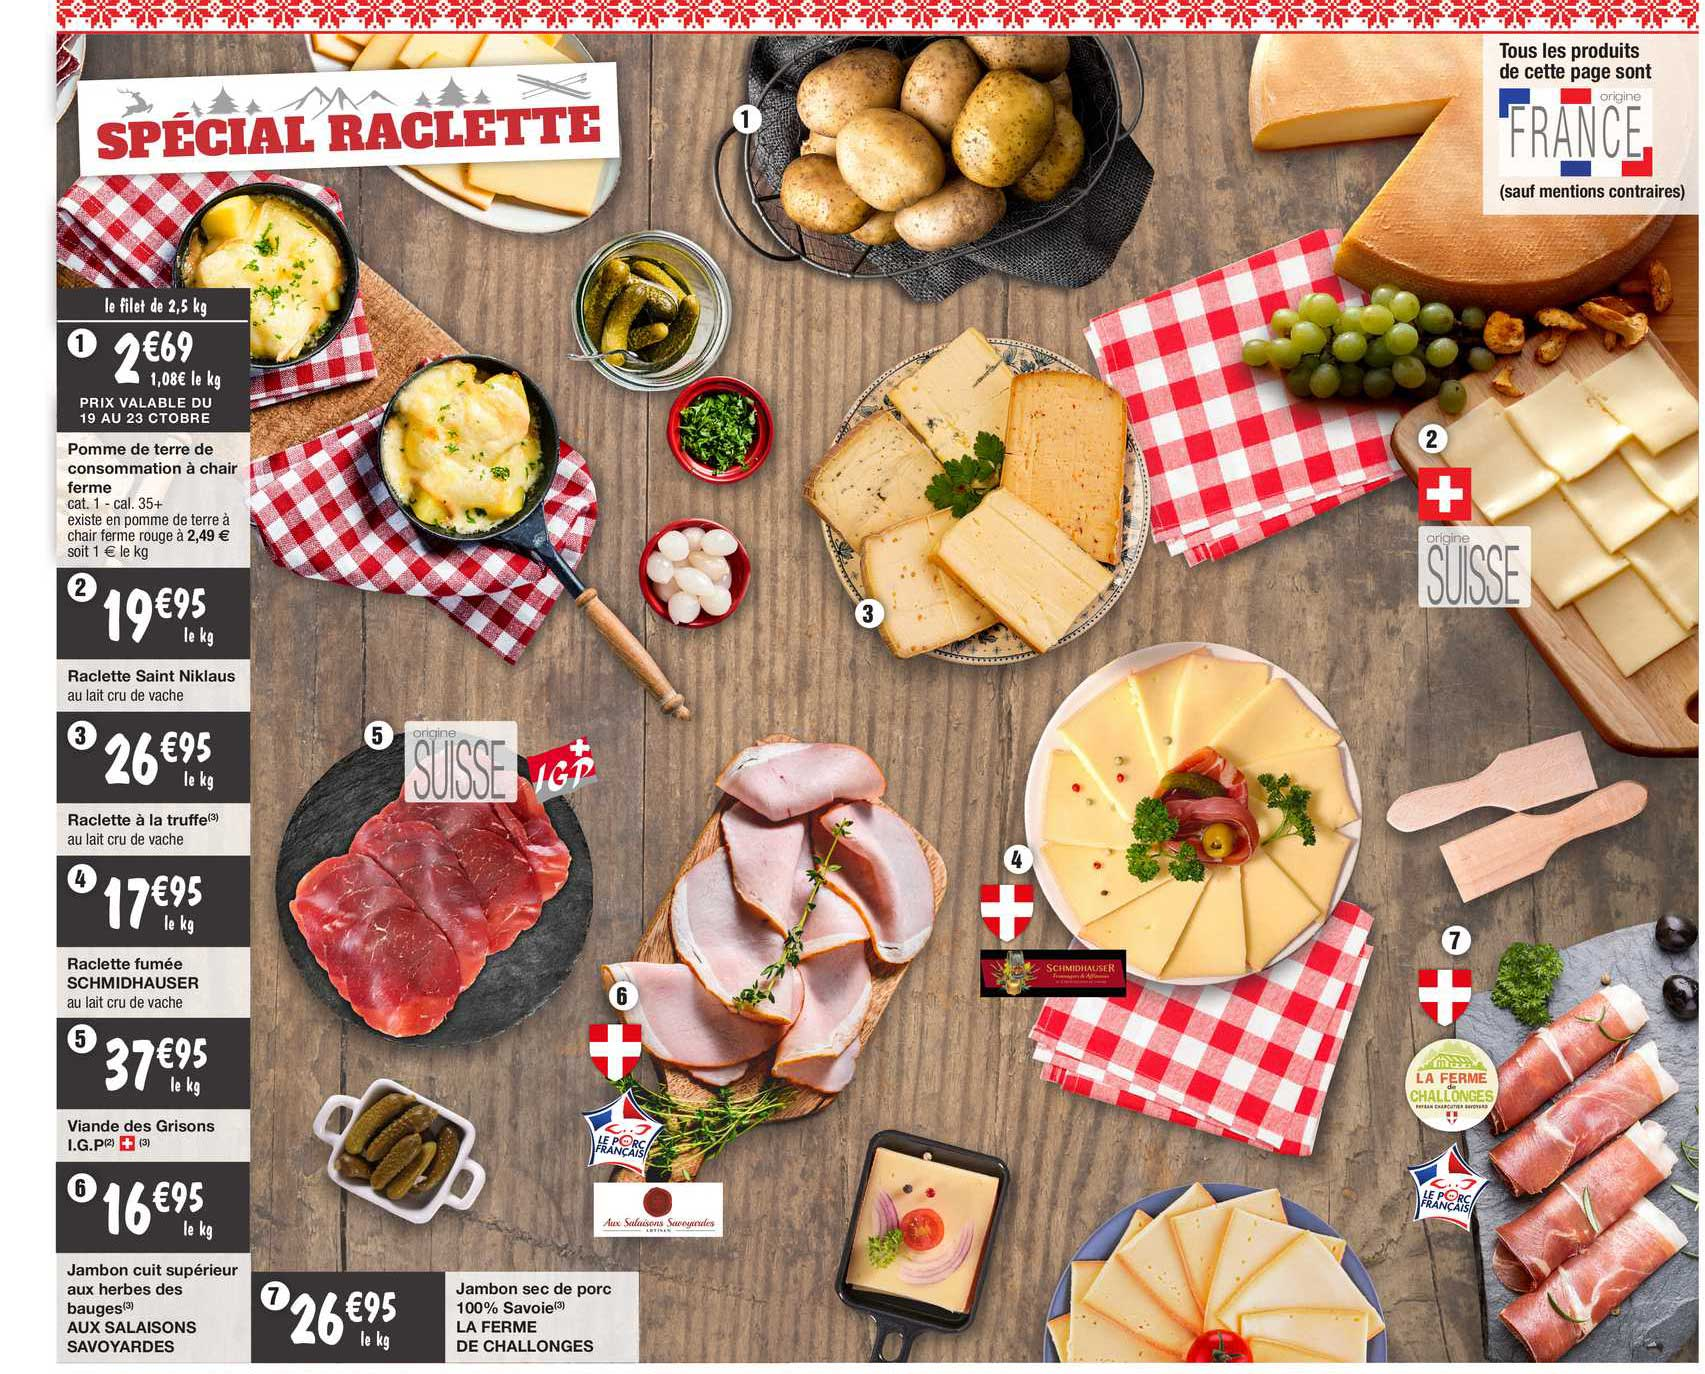 Migros France Spécial Raclette